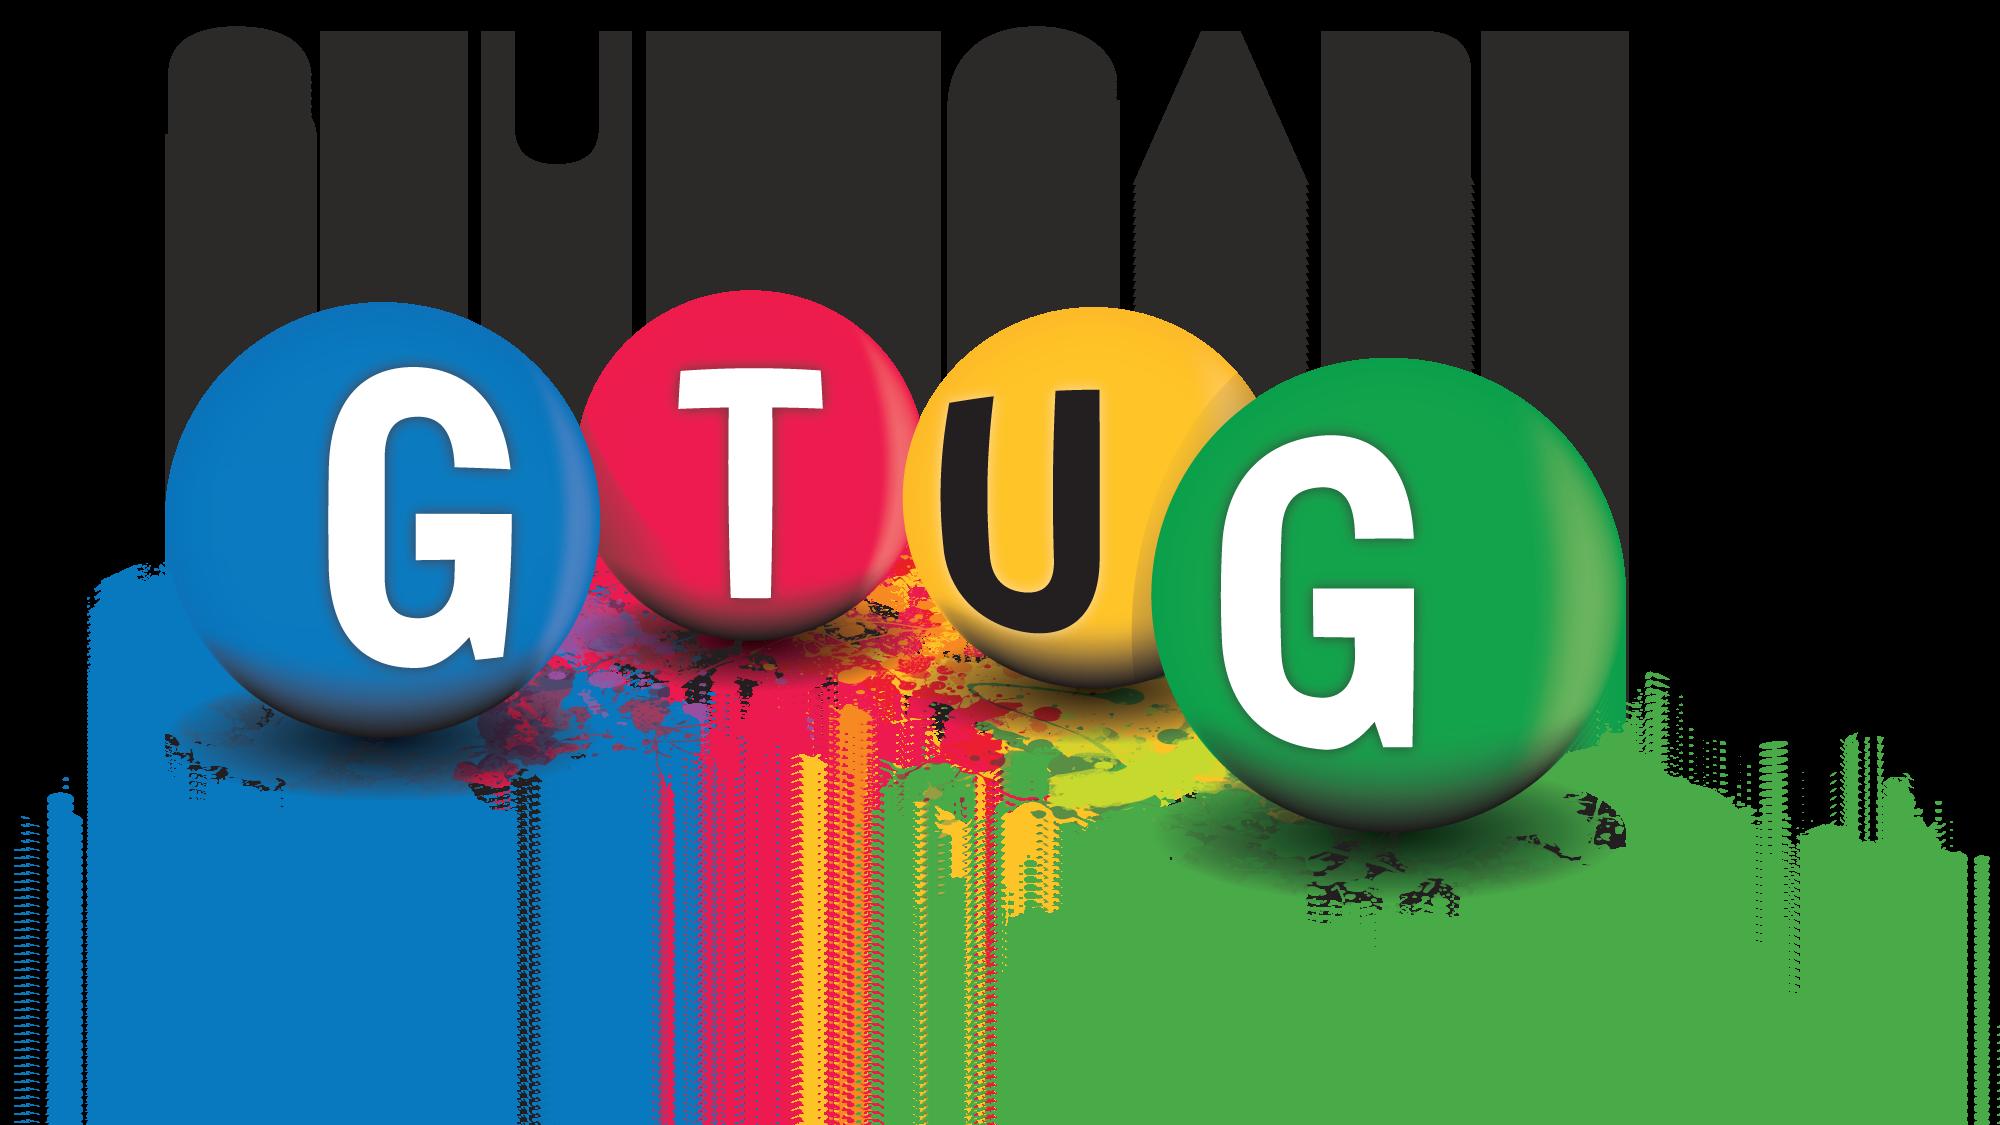 stugtug-logo